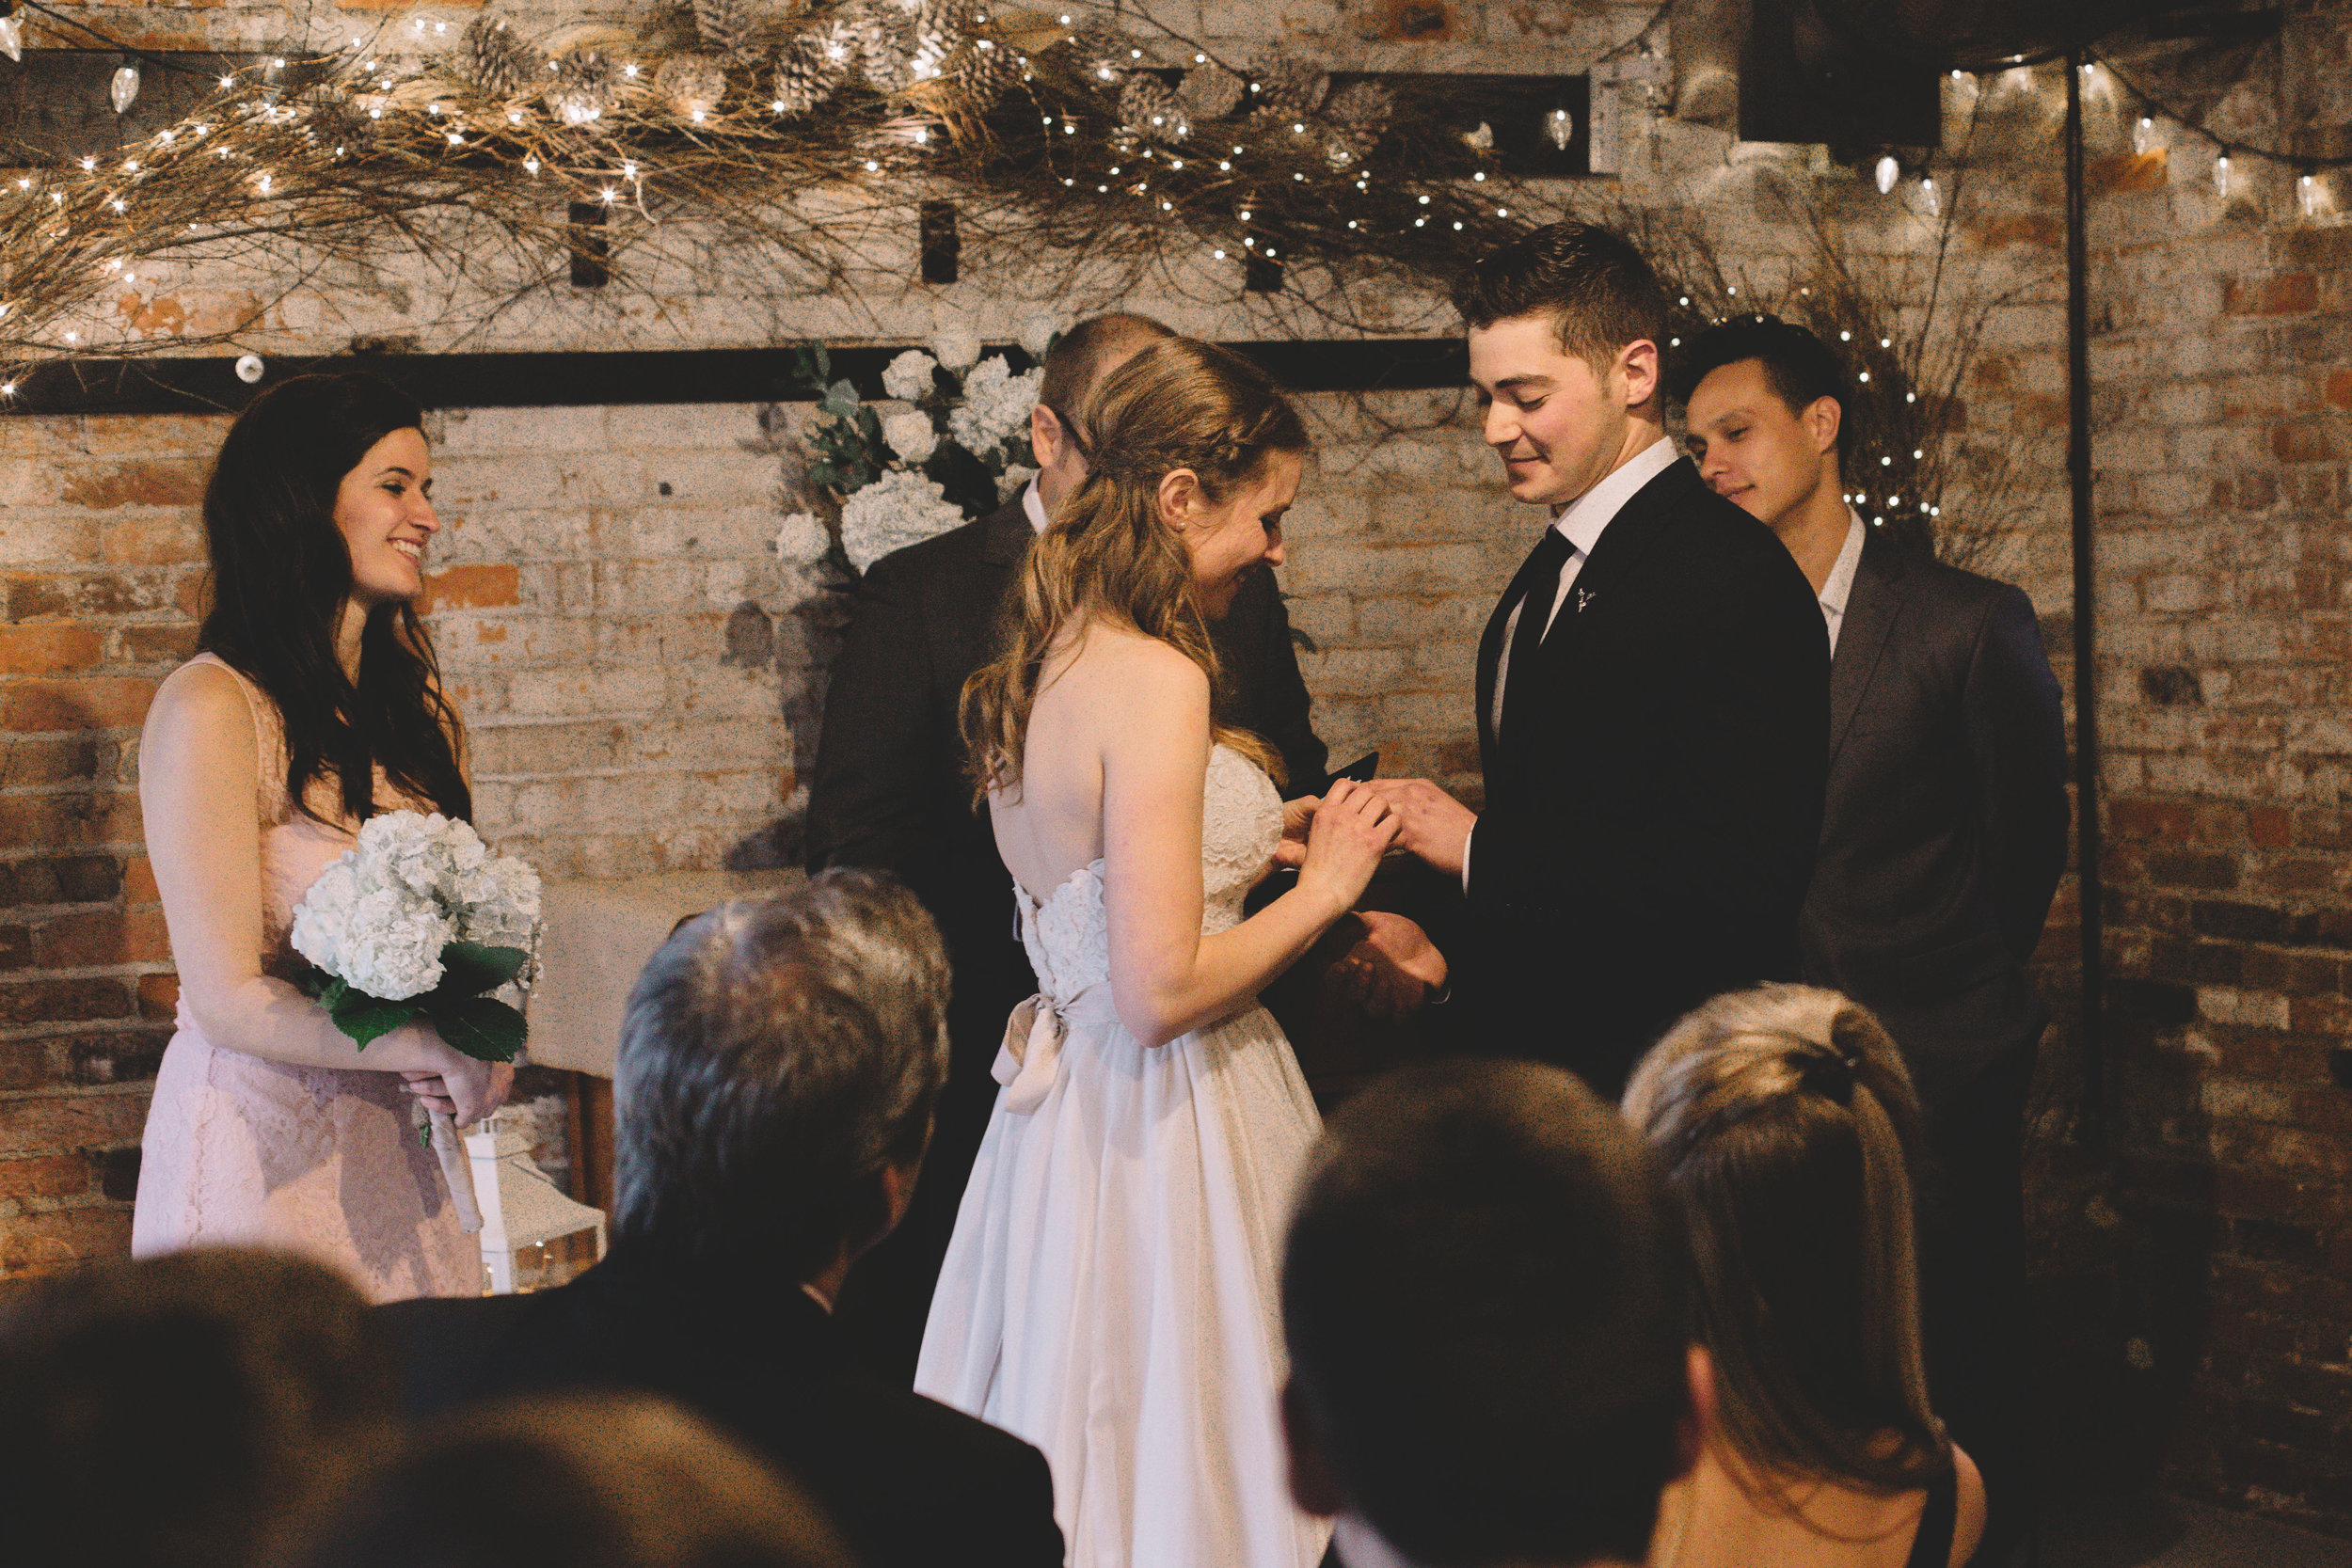 Jake + Brittney Balbas Airbnb Carriage House Wedding Evansville IN (253 of 426).jpg